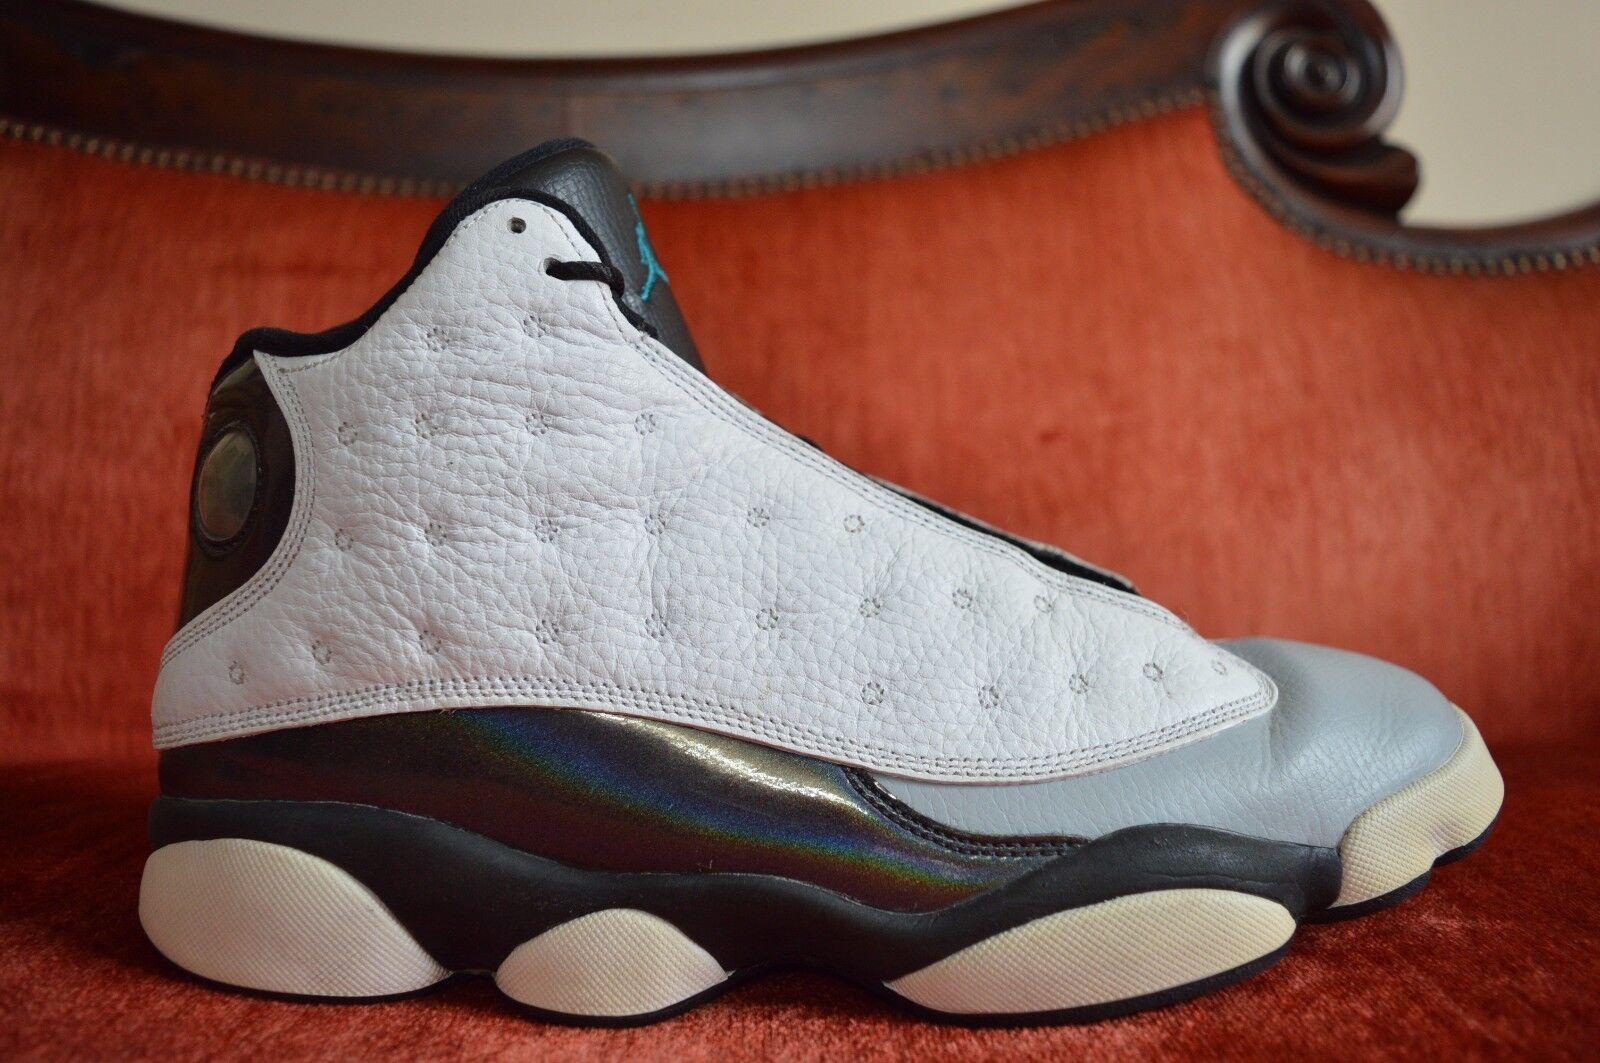 Nike Air Jordan Retro 13 Hologram Barons White Grey Teal Black 414571 115 11